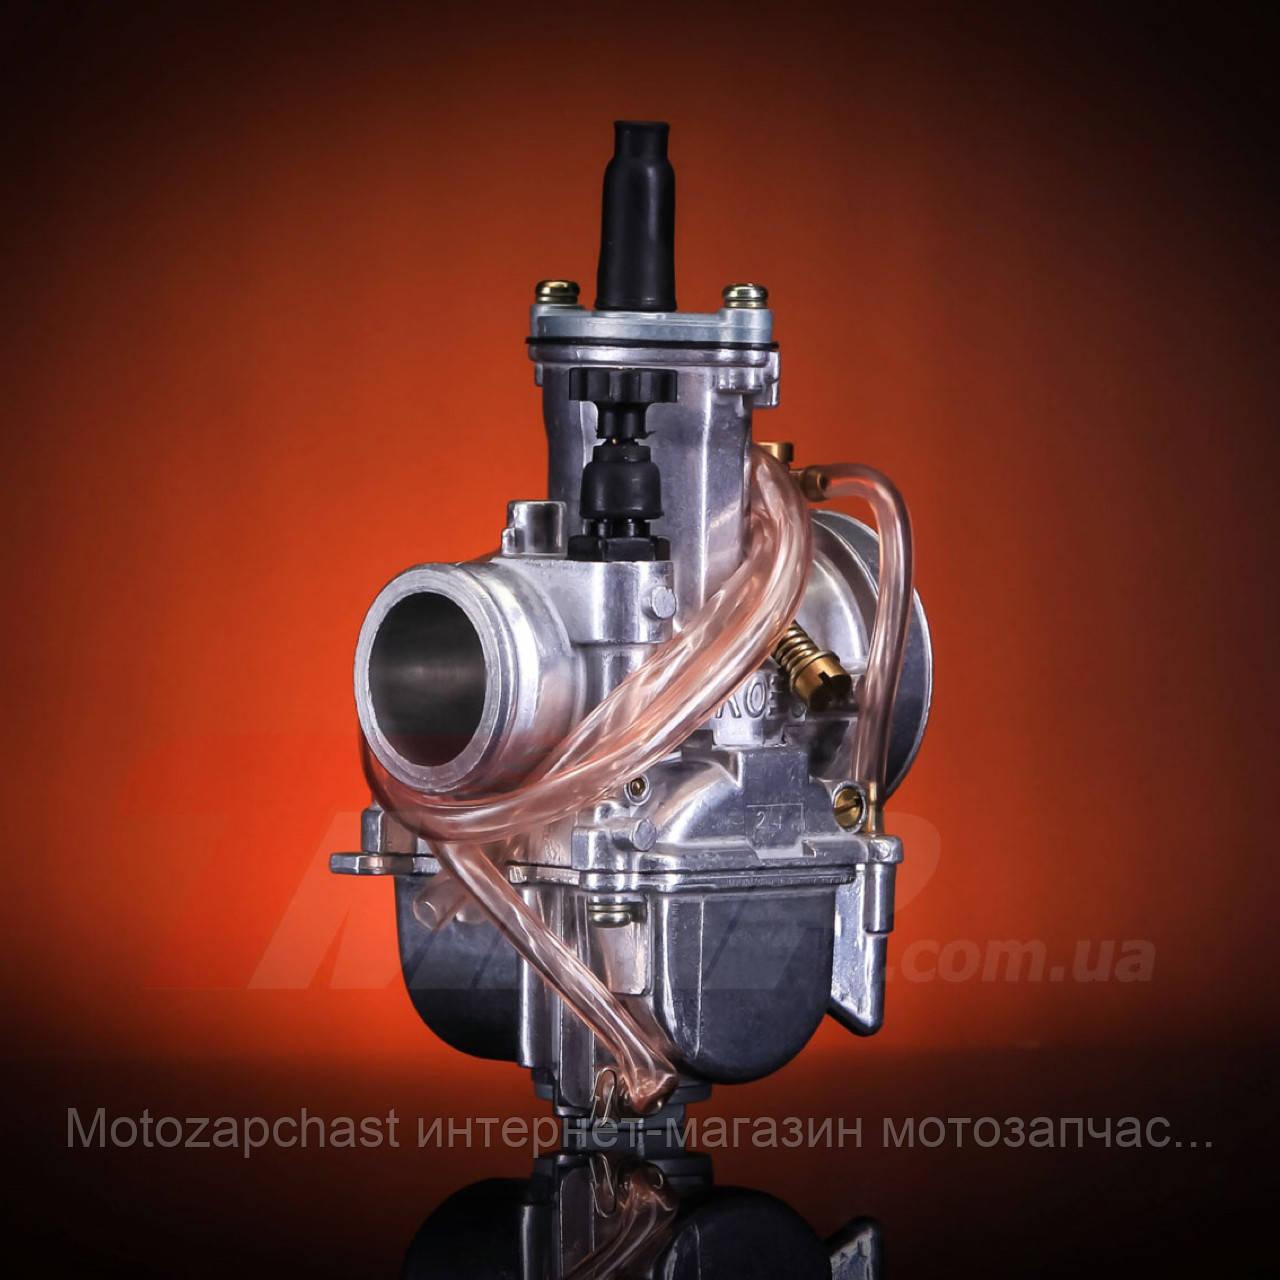 Карбюратор Ява 12V 26 мм (OKO) - «Motozapchast» интернет-магазин мотозапчастей в Харькове